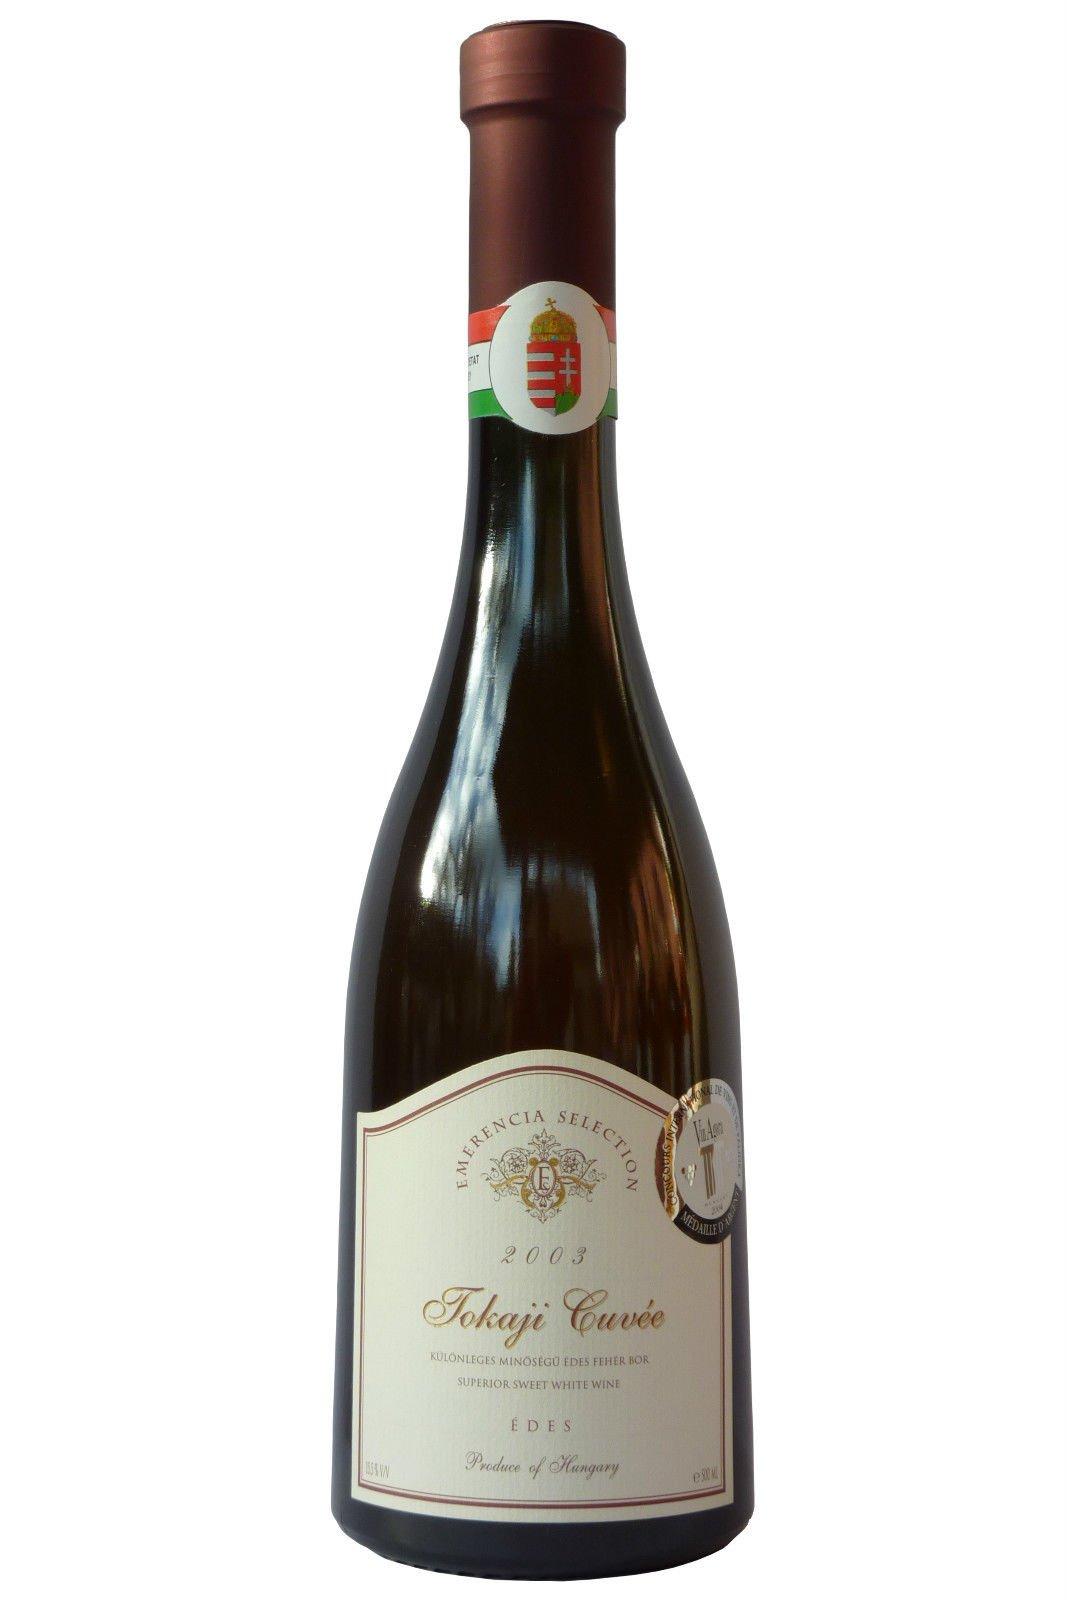 Tokaji-Cuvee-Emerencia-Selection–Jahrgang-2003-Trockenbeerenauslese-aus-Ungarn-Weiwein-S